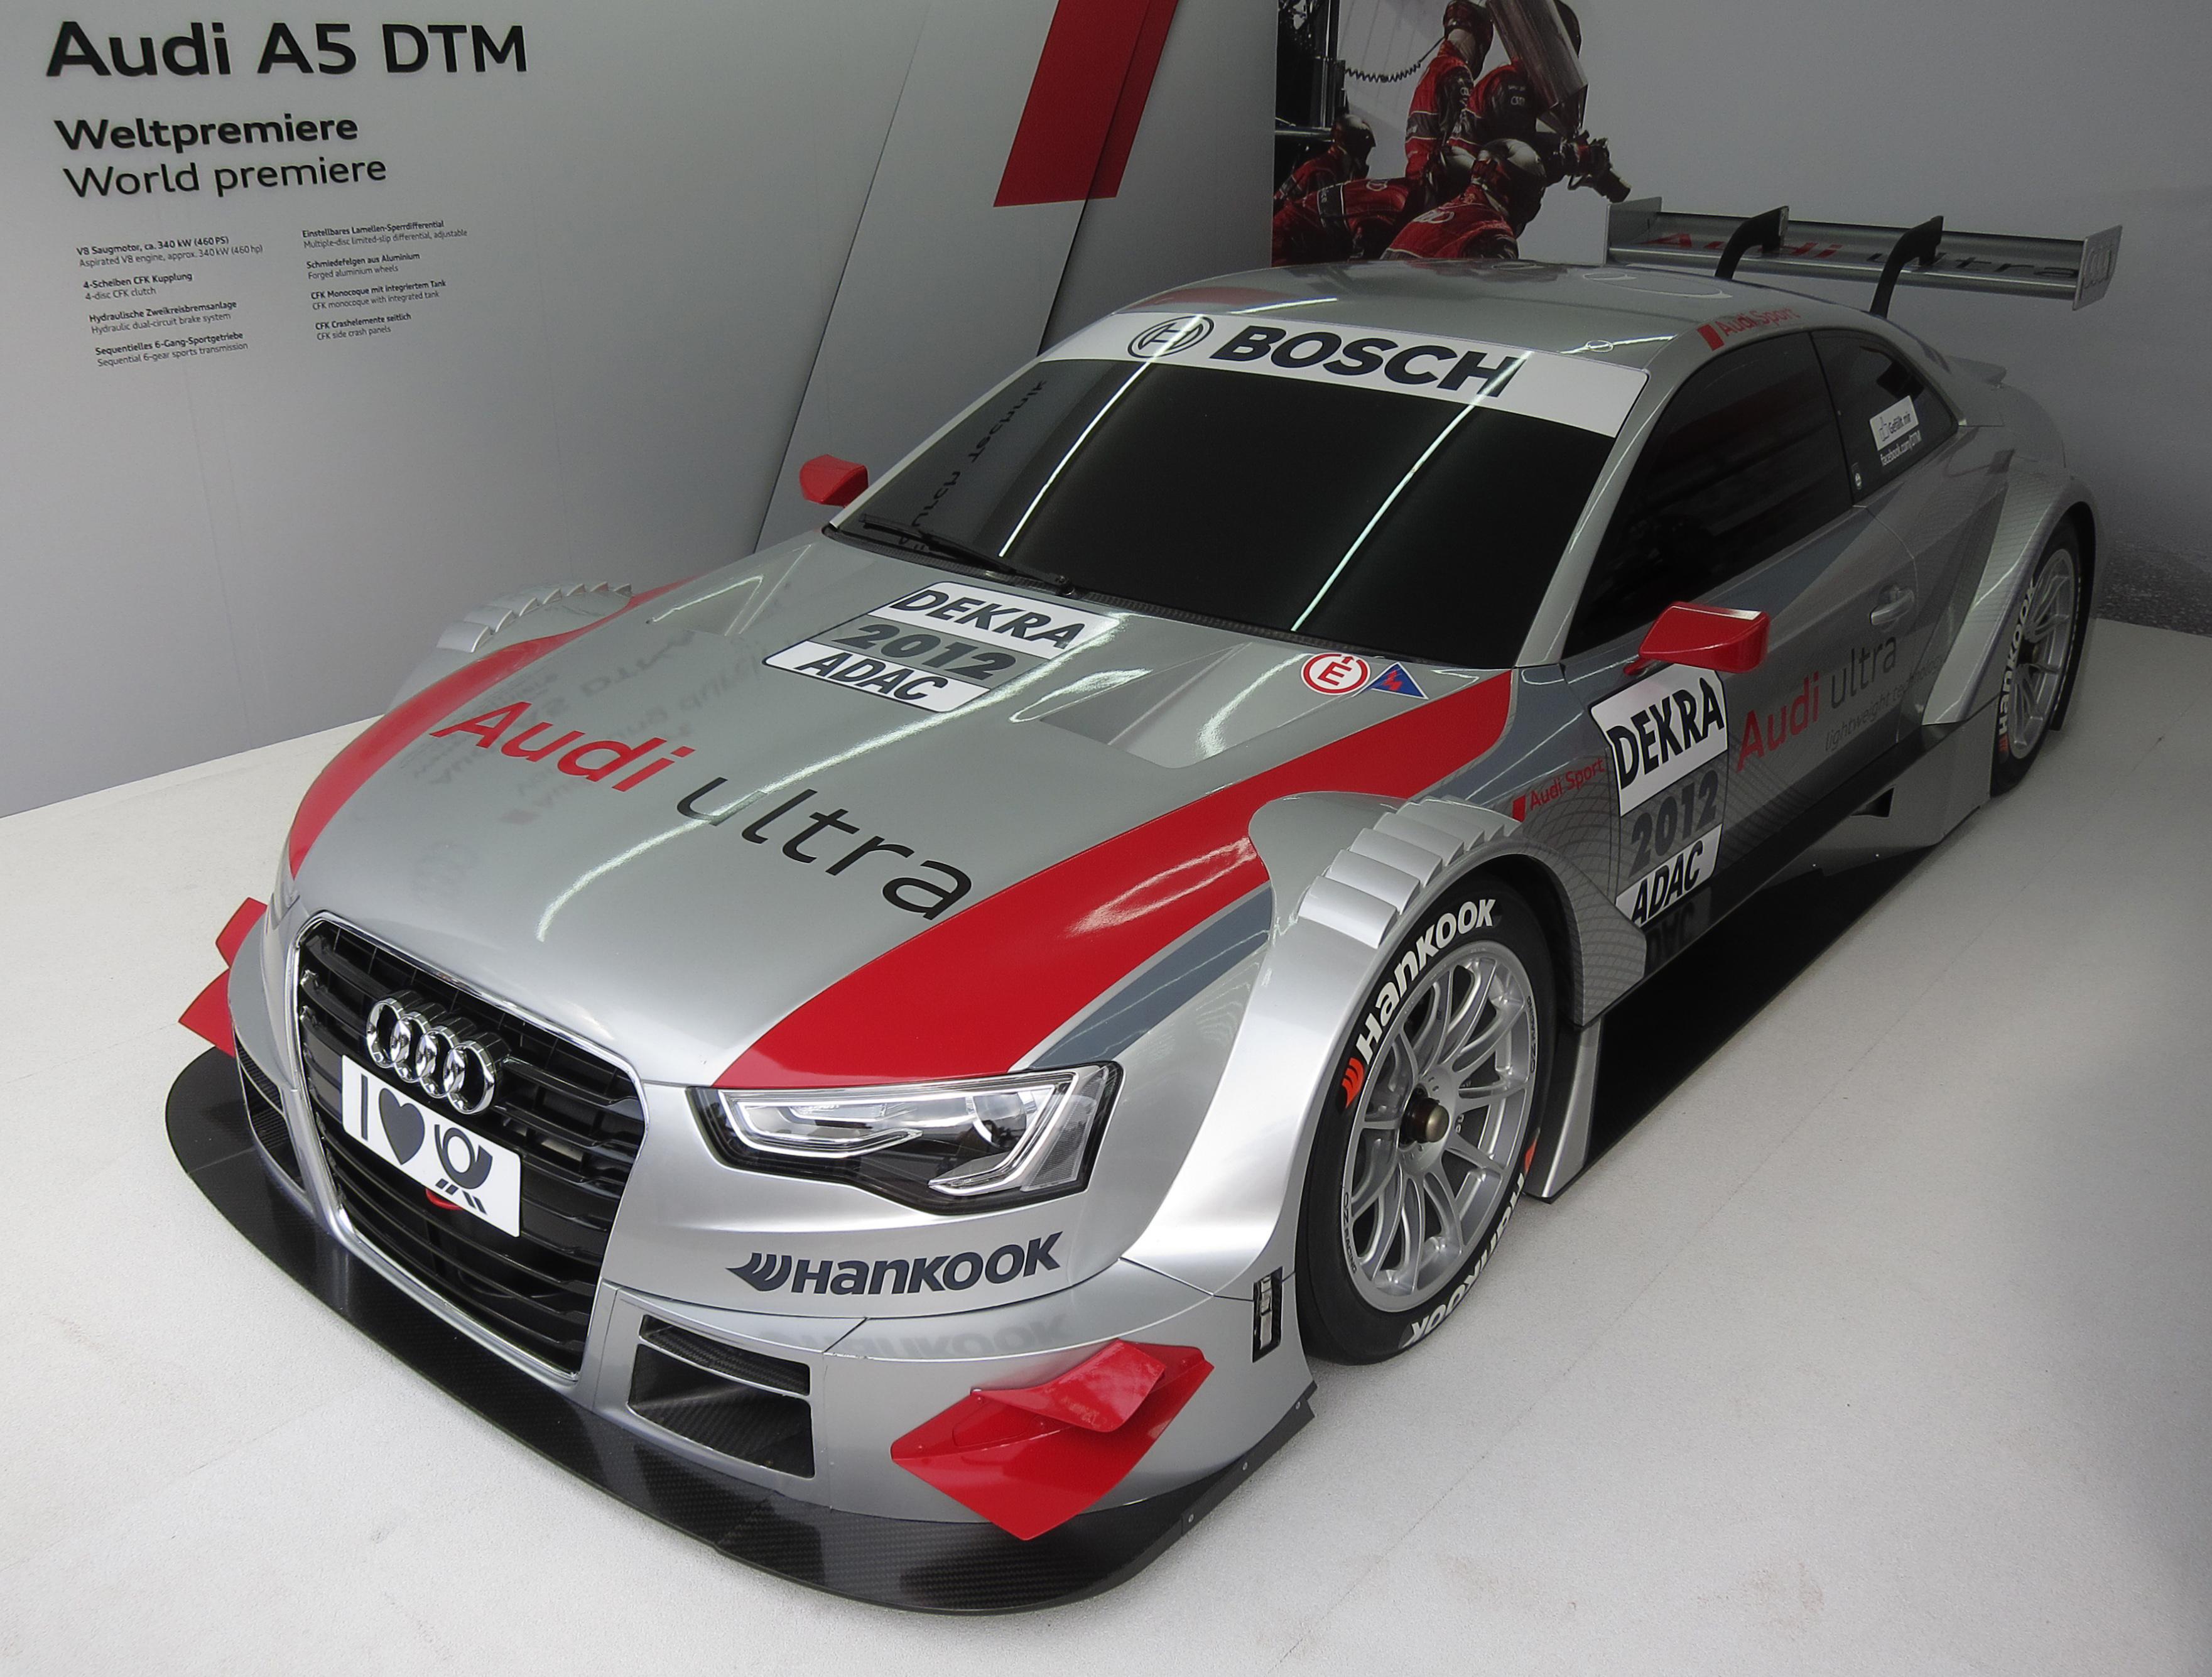 Audi 5 Series DTM (naturally-aspirated) - Wikipedia